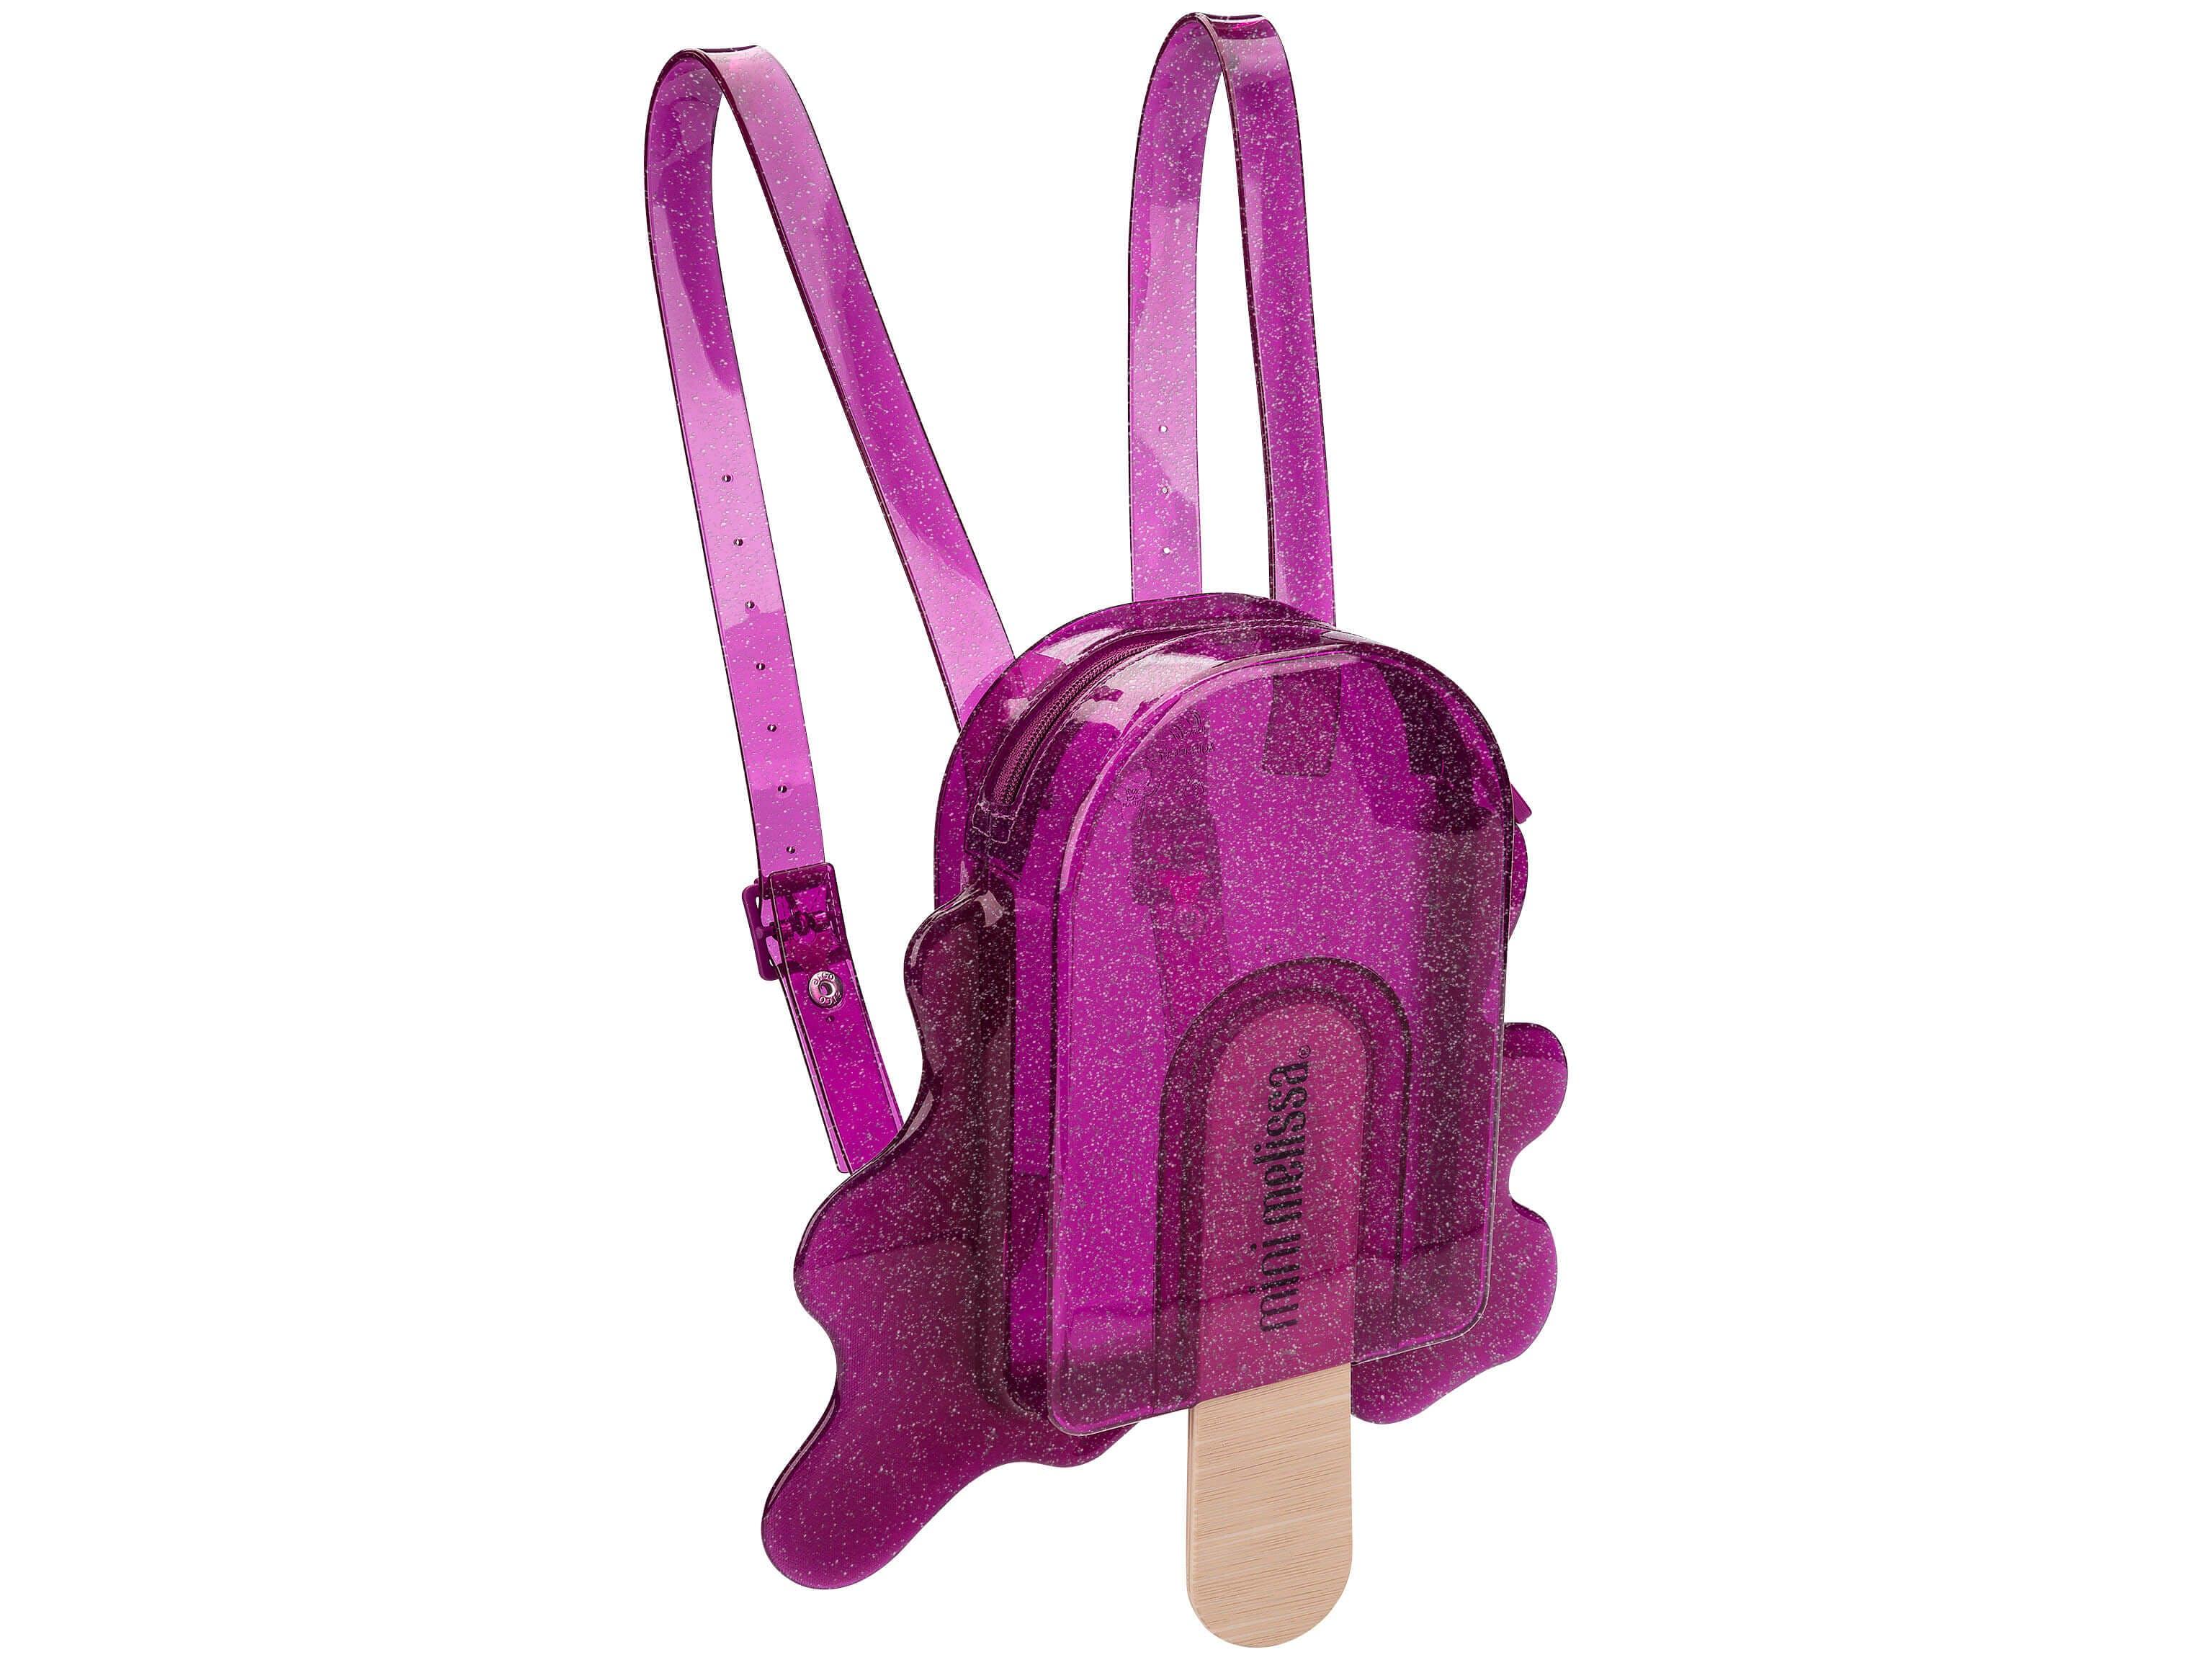 Mini Melissa Cute Bag Popsicle  2019 Original Girl Jelly Shoes Bag With Sandal  2 colorMini Melissa Cute Bag Popsicle  2019 Original Girl Jelly Shoes Bag With Sandal  2 color